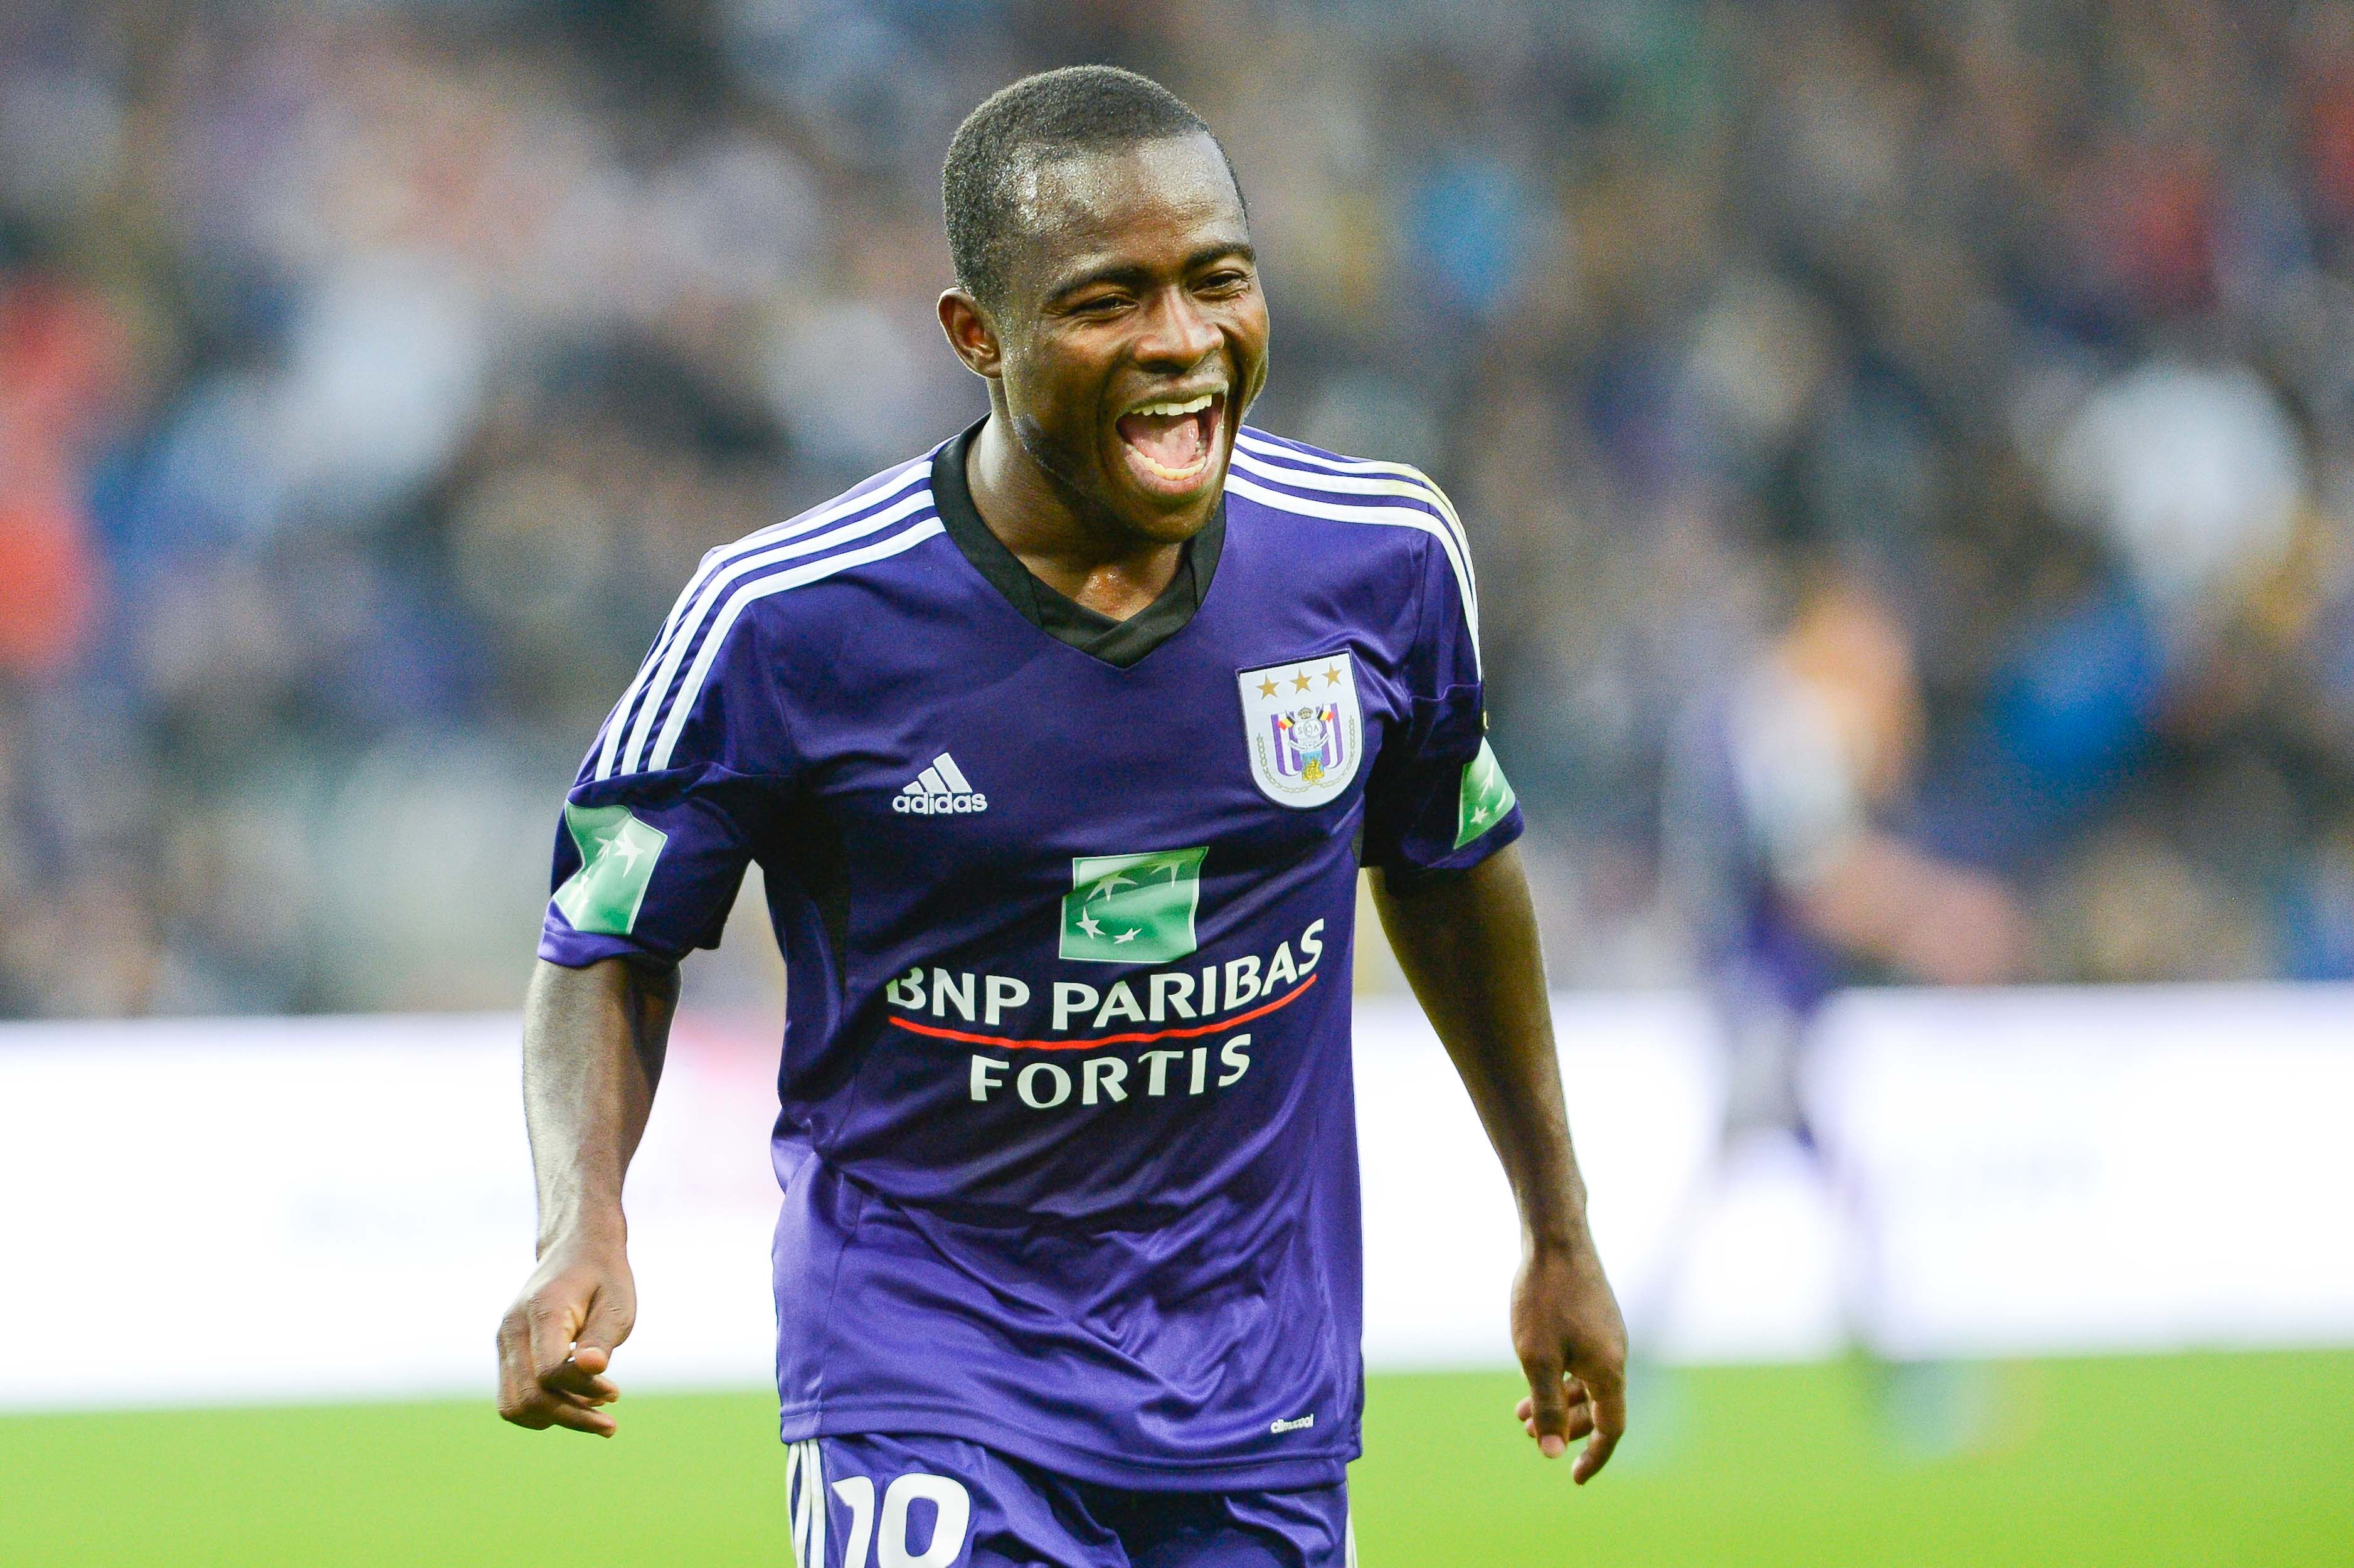 Frank Acheampong has been outstanding for Anderlecht